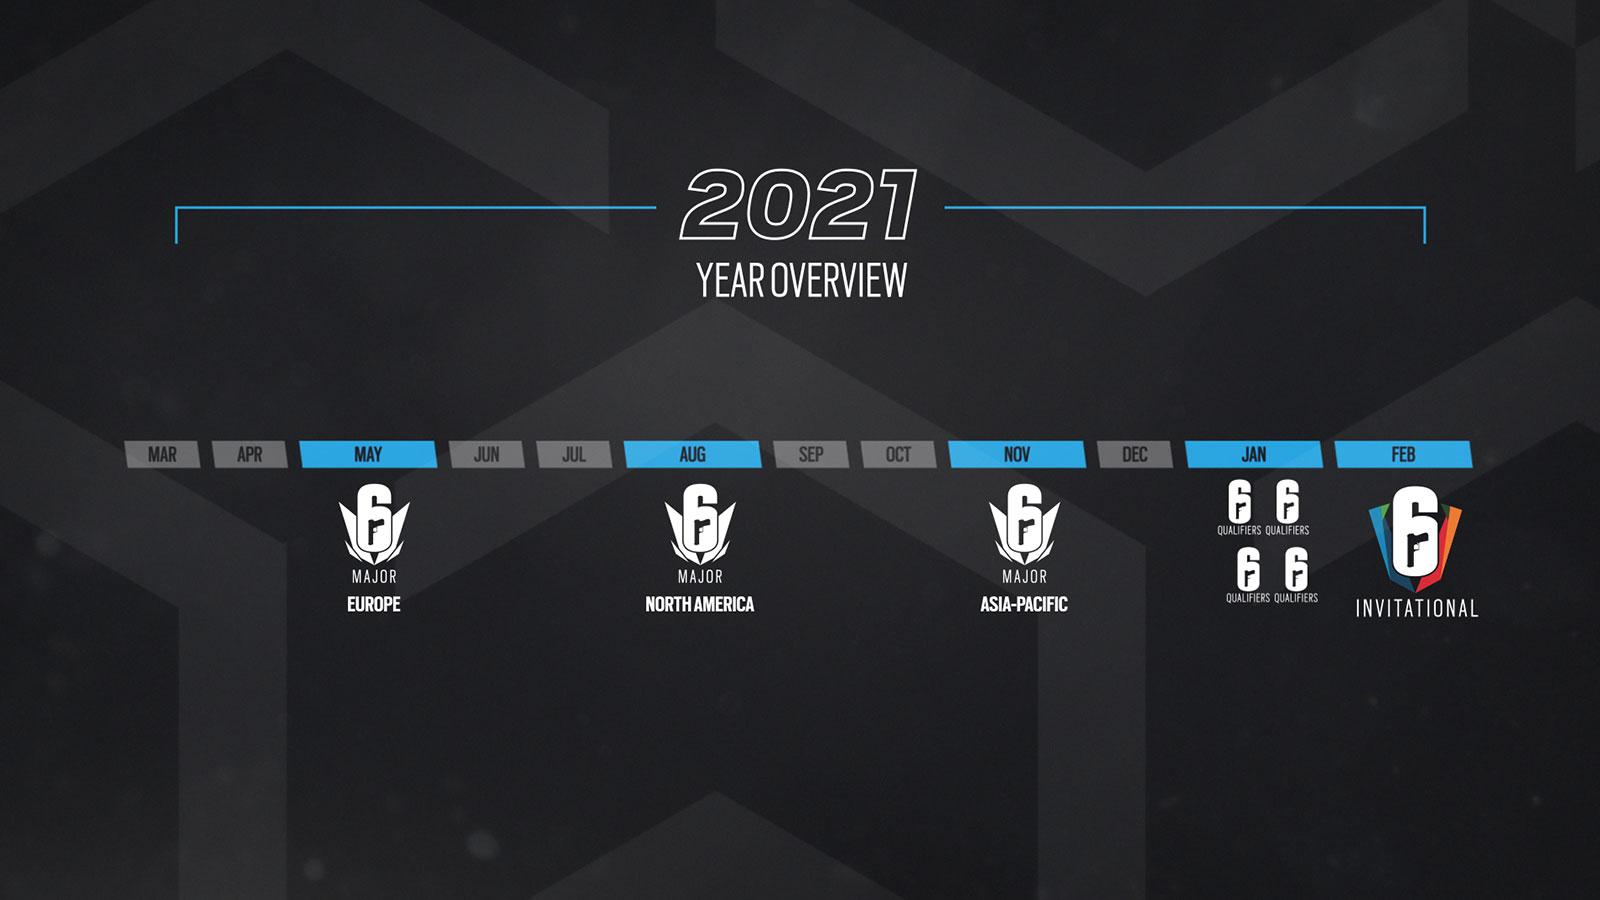 Programme année 2021 R6 Siege Ubisoft